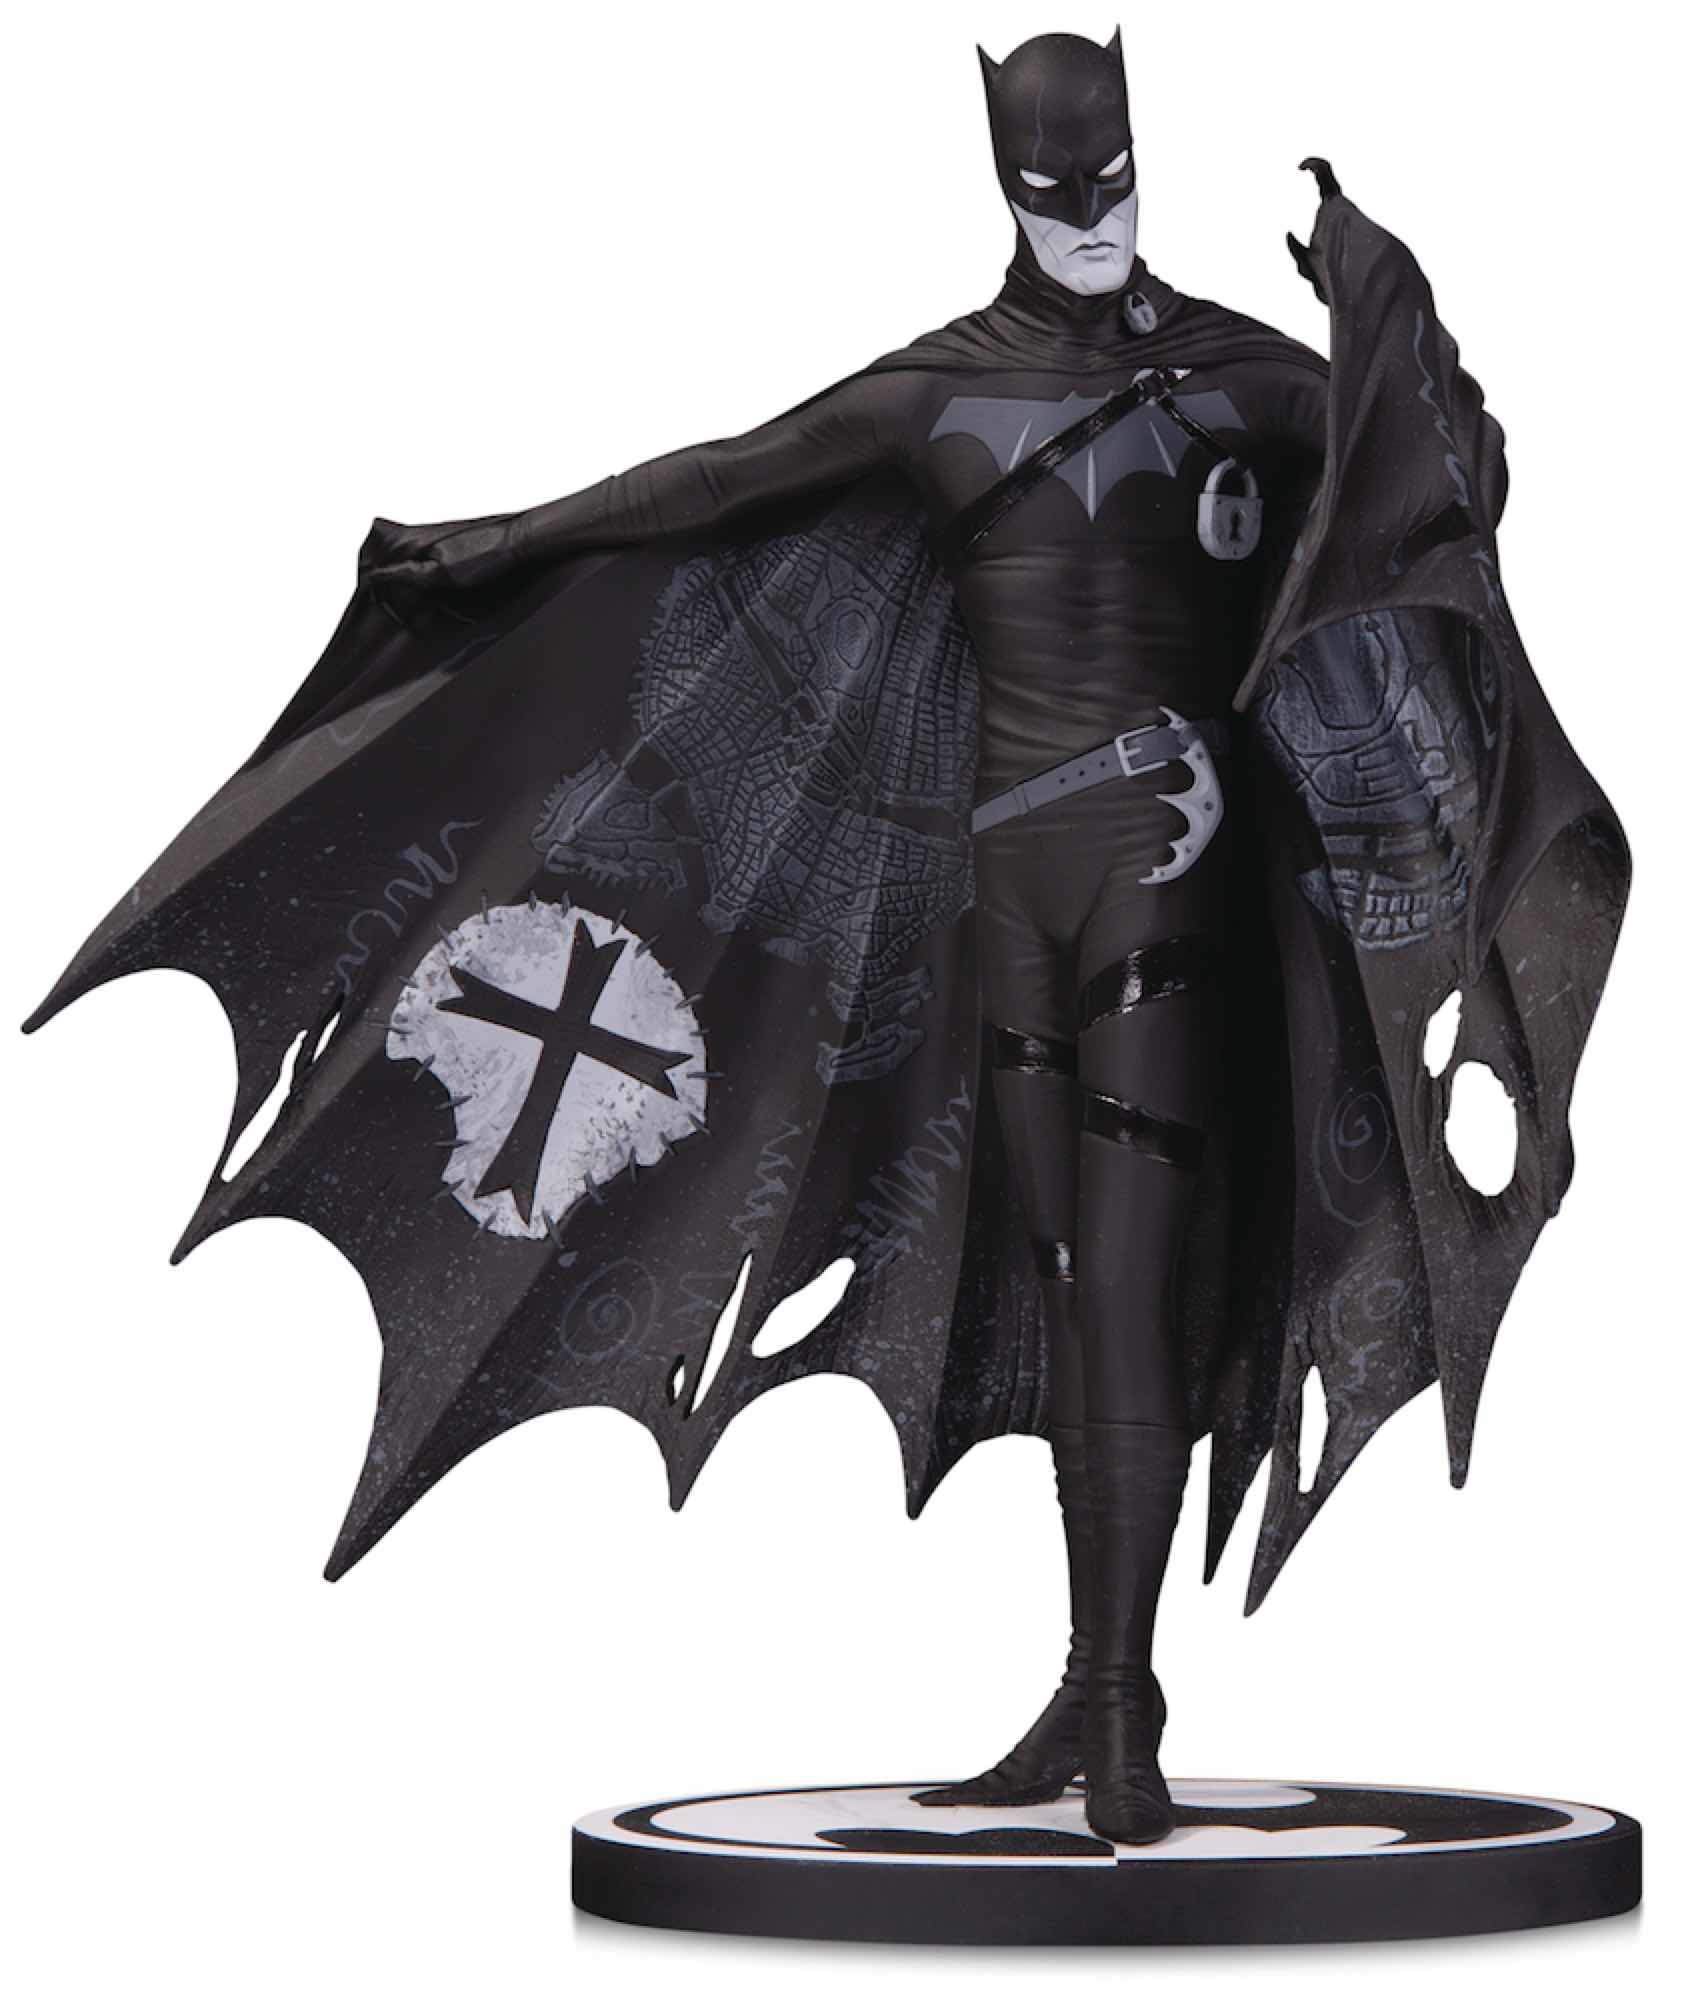 BATMAN B&W BLACK AND WHITE BY GERARD WAY ESTAT...